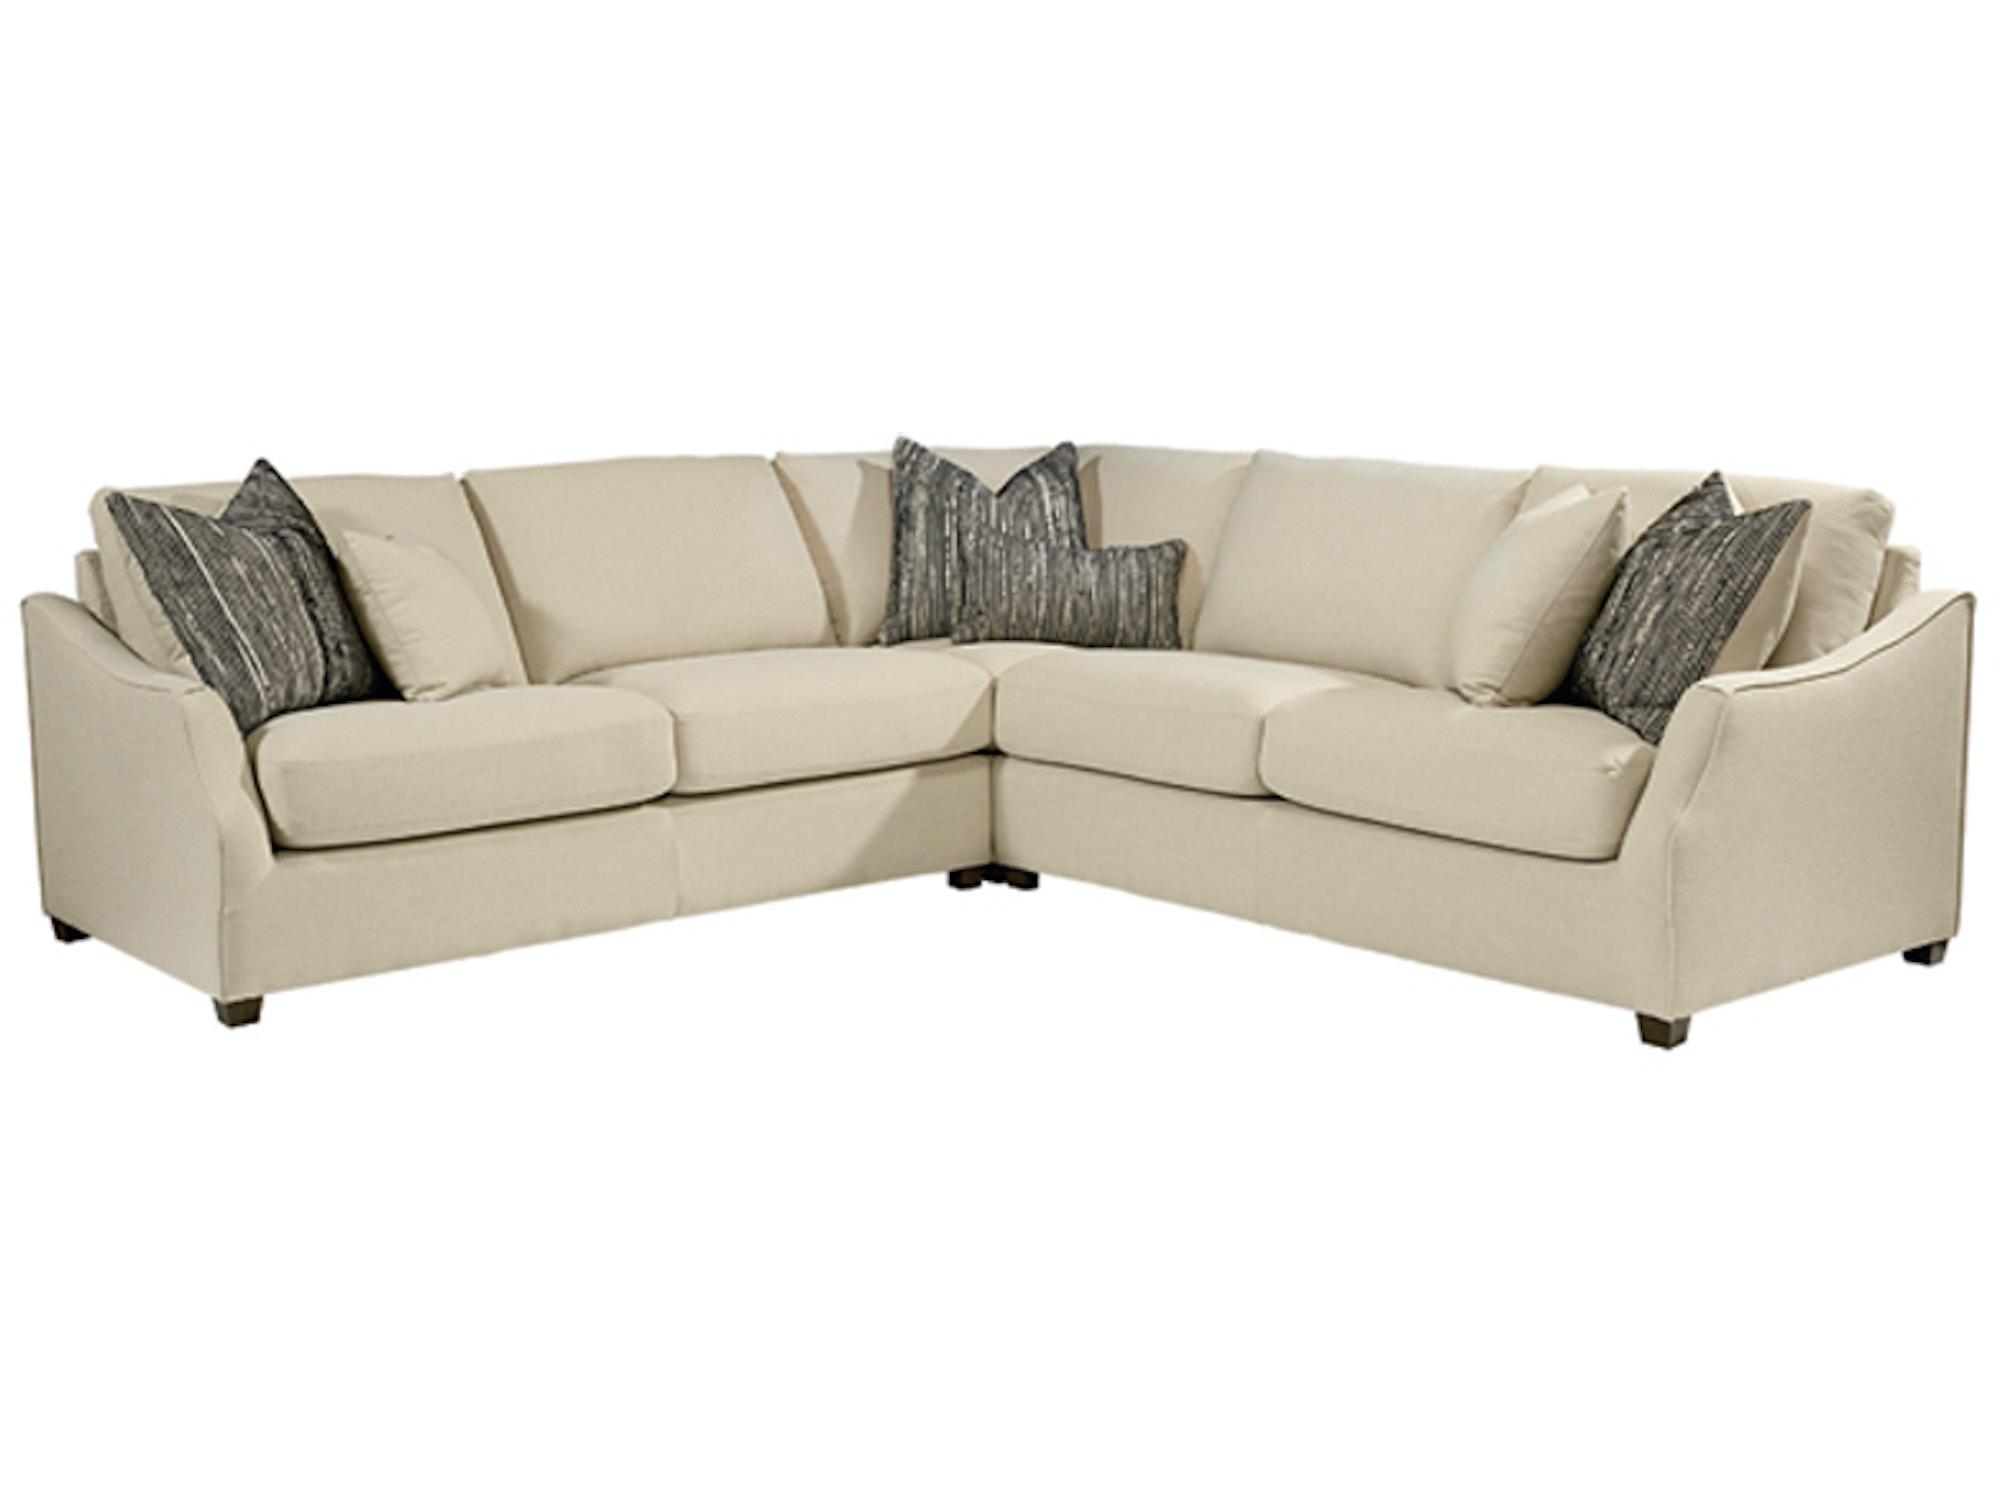 Furniture sectionals furniture fair cincinnati for Sectional sofa furniture fair